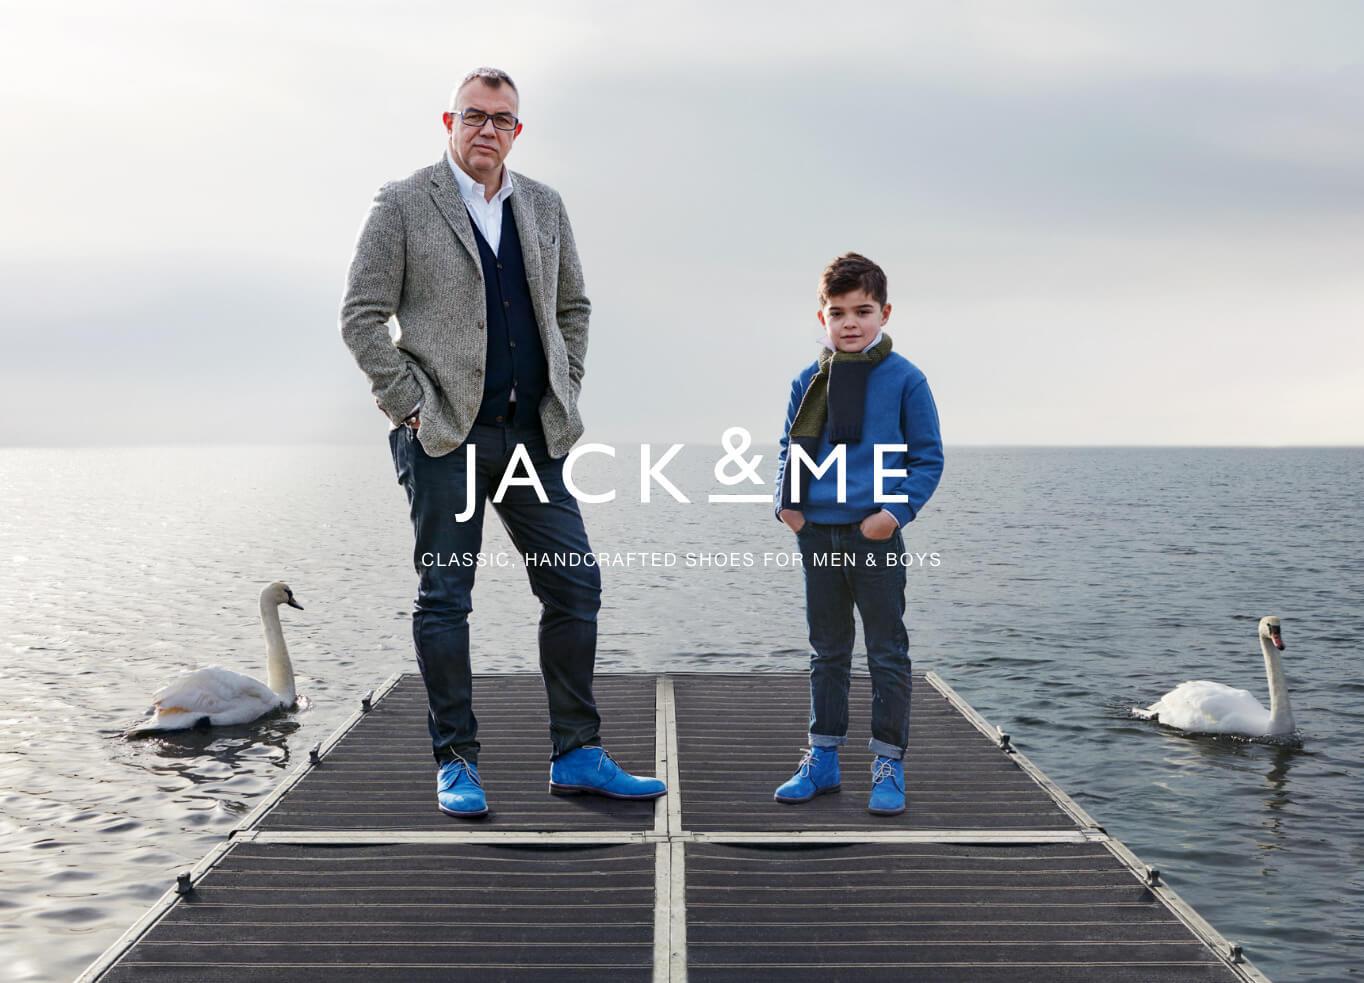 2019 – Jack&Me: WordPress Web Design